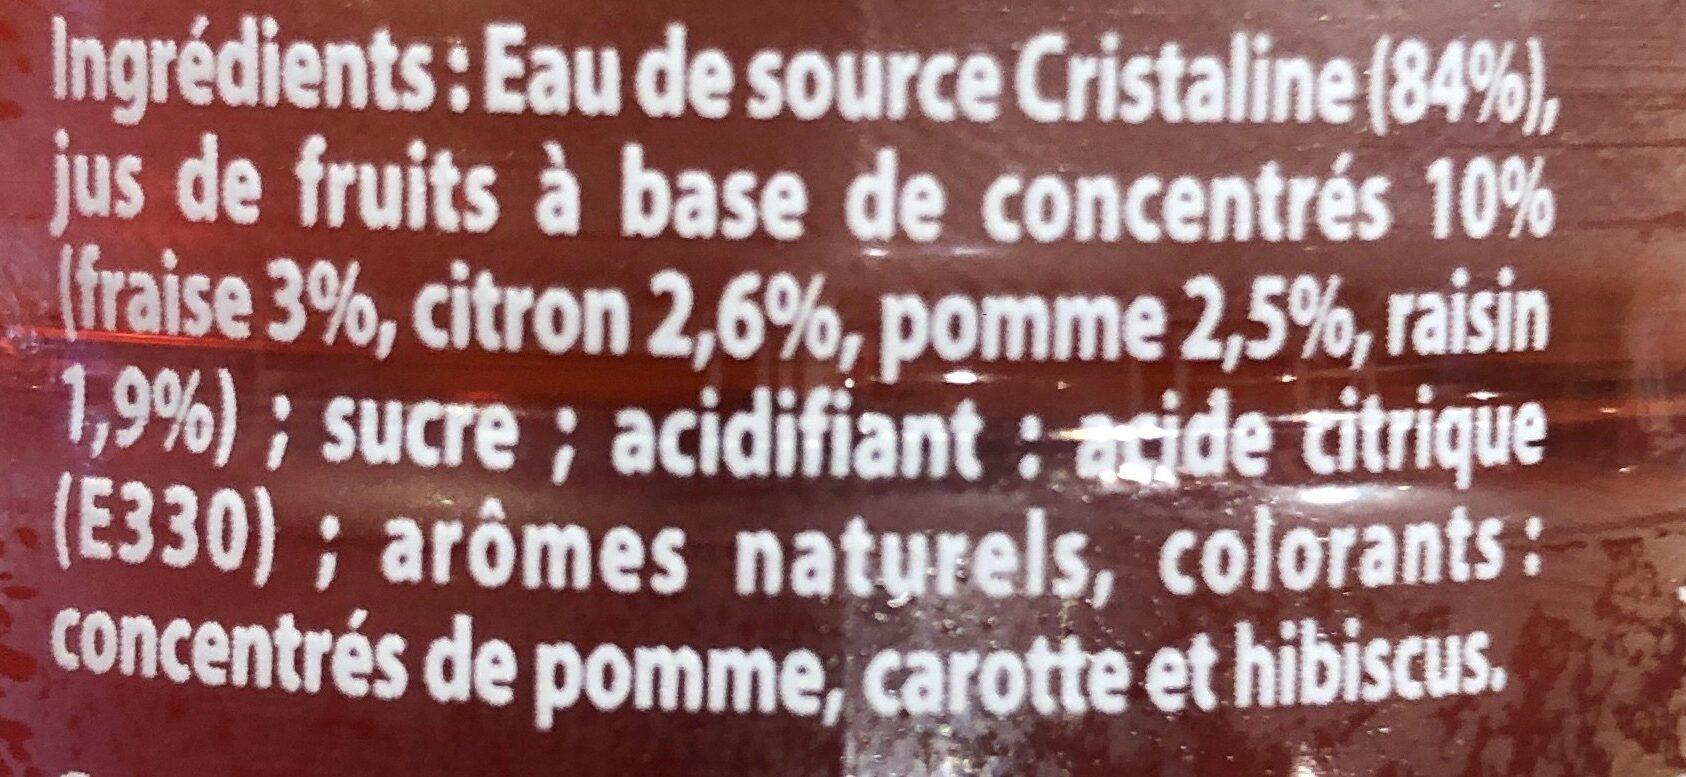 Cristaline Fraise - Ingrédients - fr